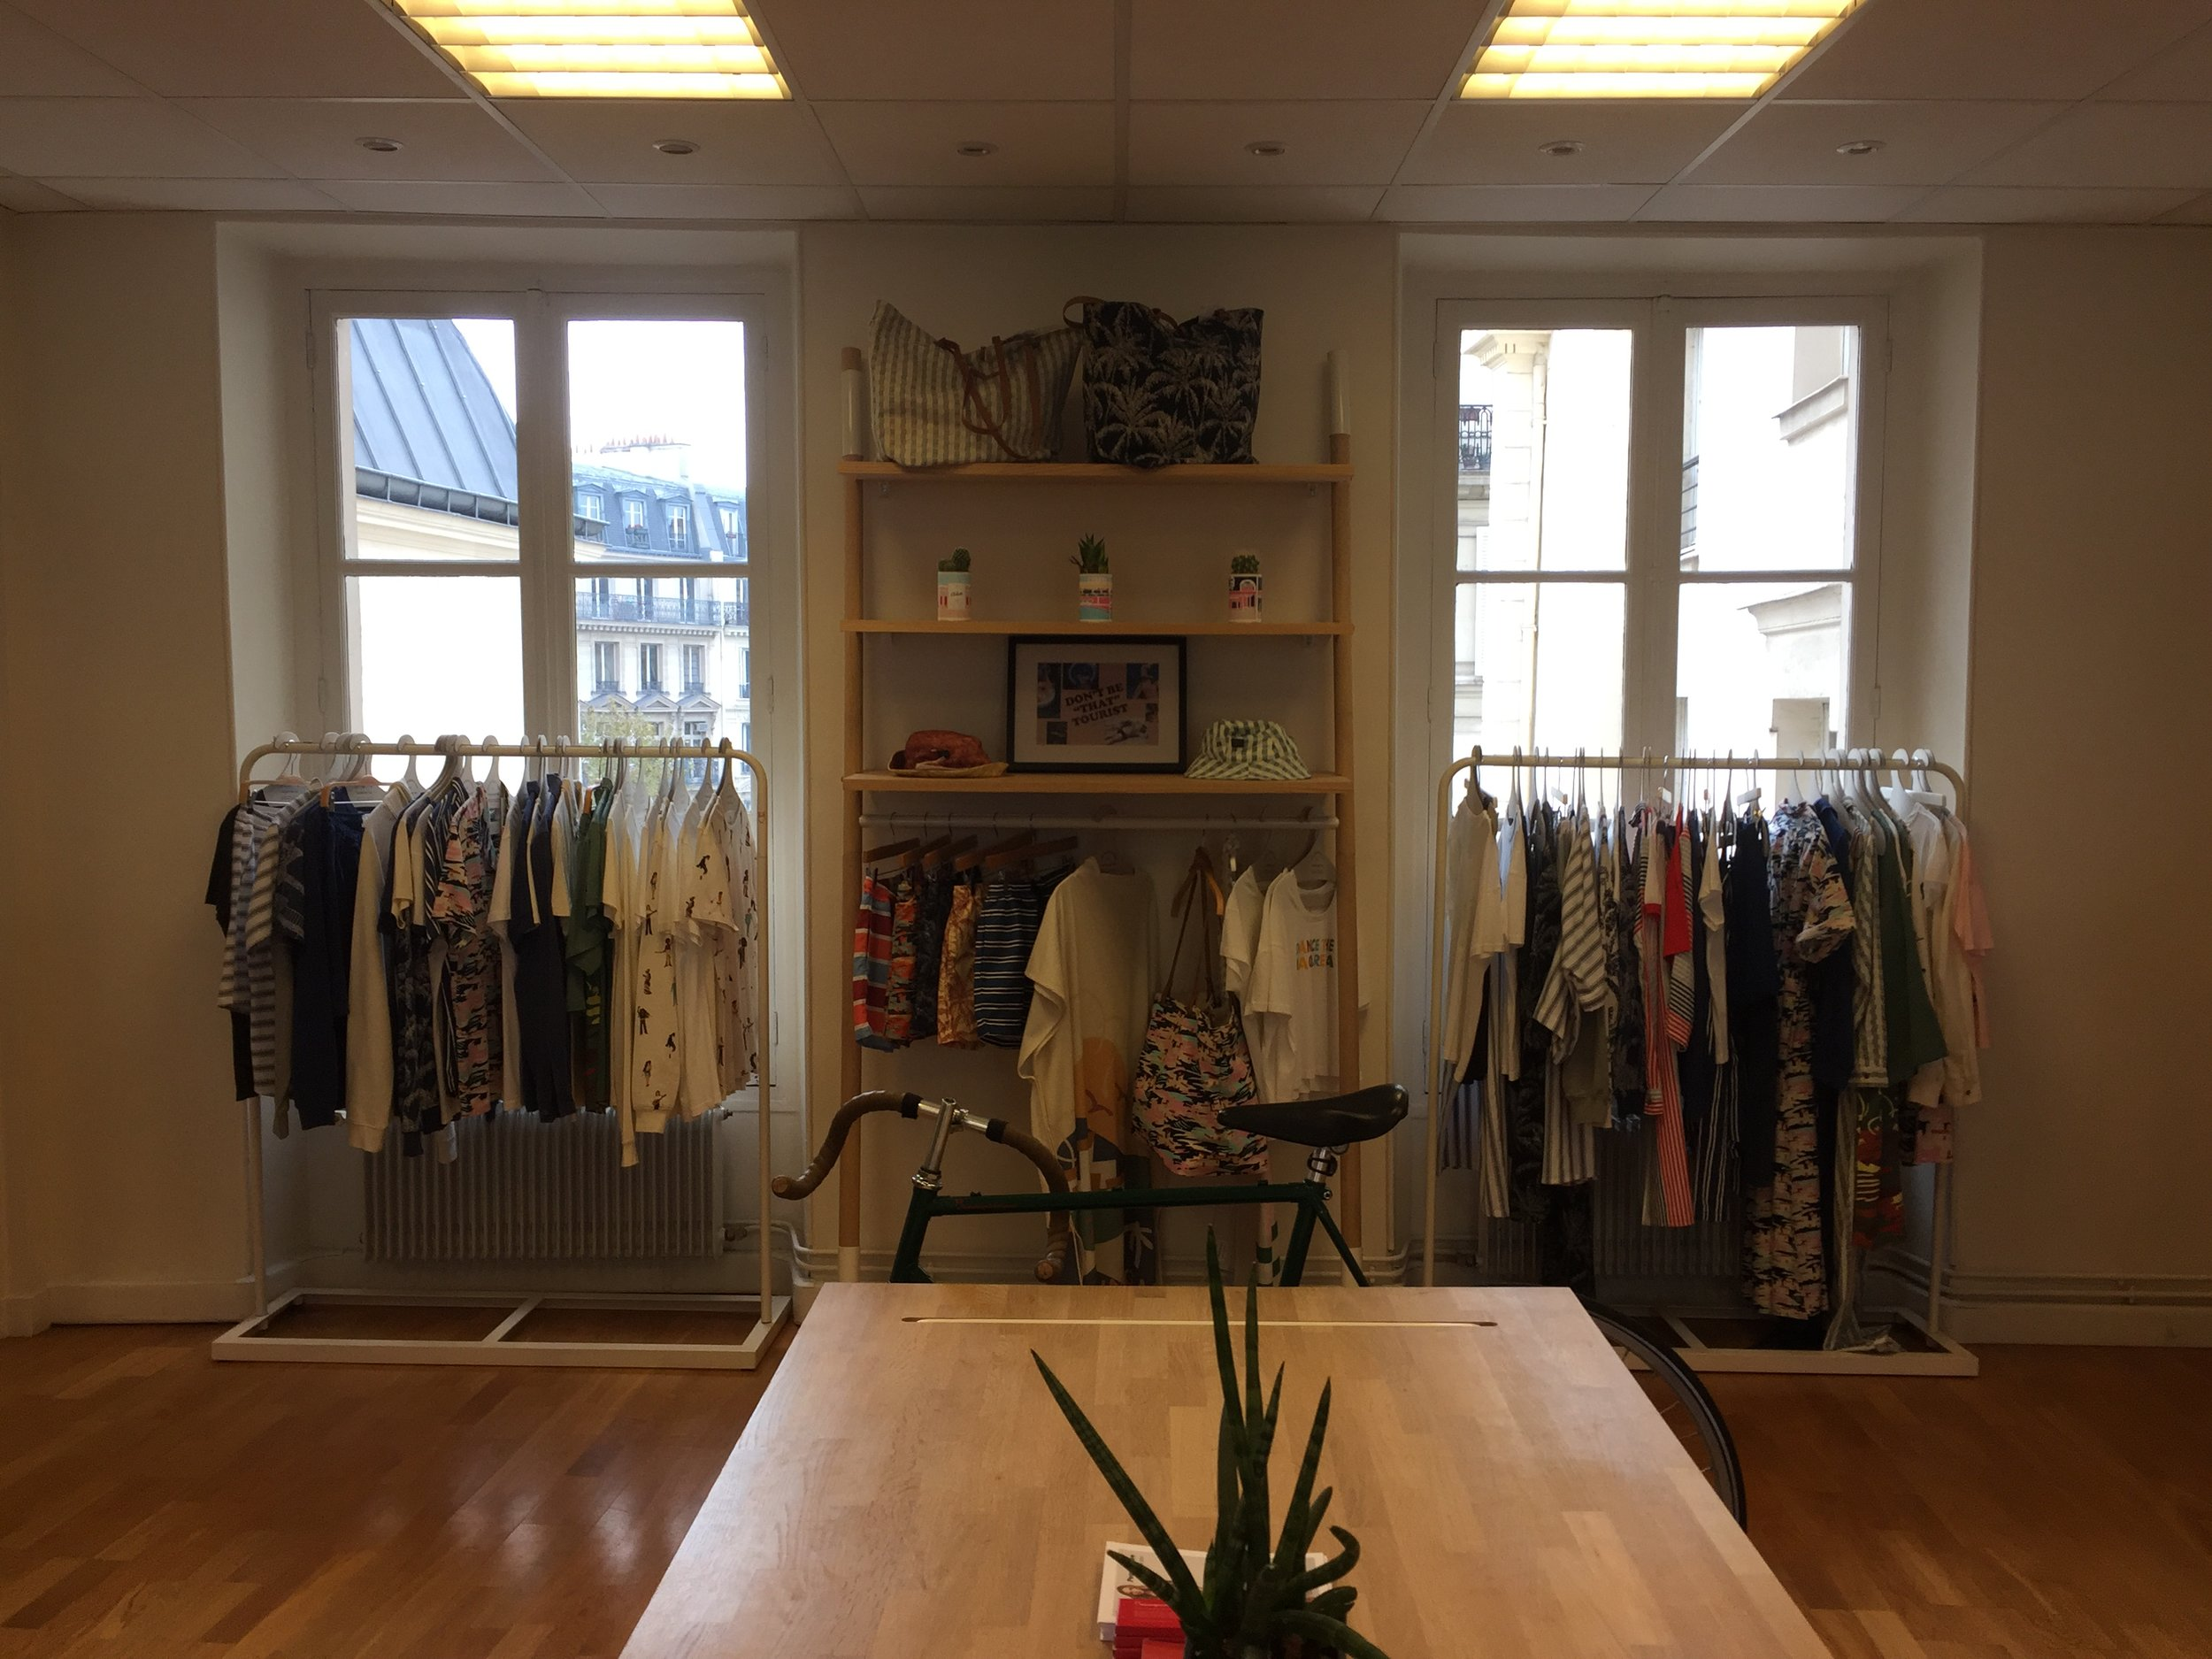 Press day 2018 - The Clothette - Thinking Mu